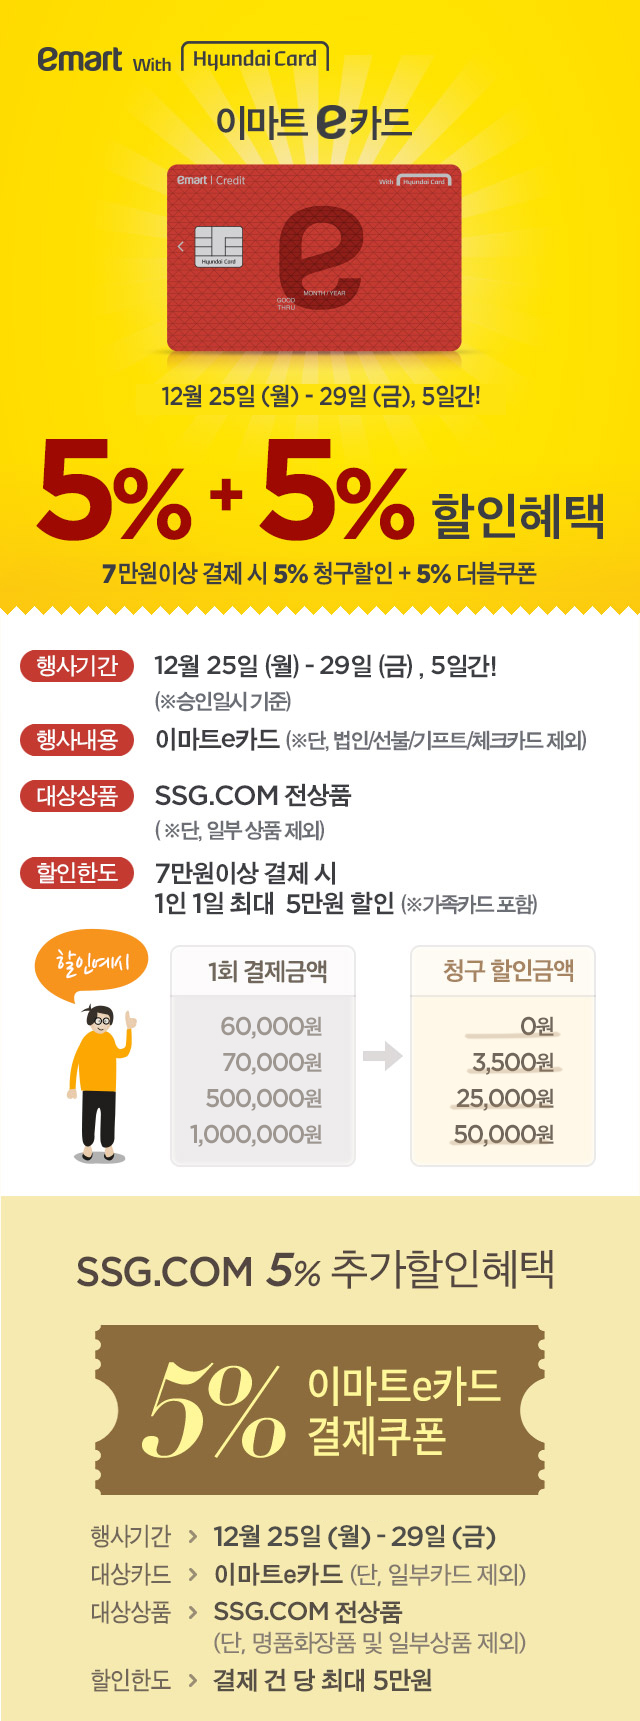 586c0f6fe65 이벤트&쿠폰 > 이마트e카드 5%+5% 할인혜택, 신세계몰